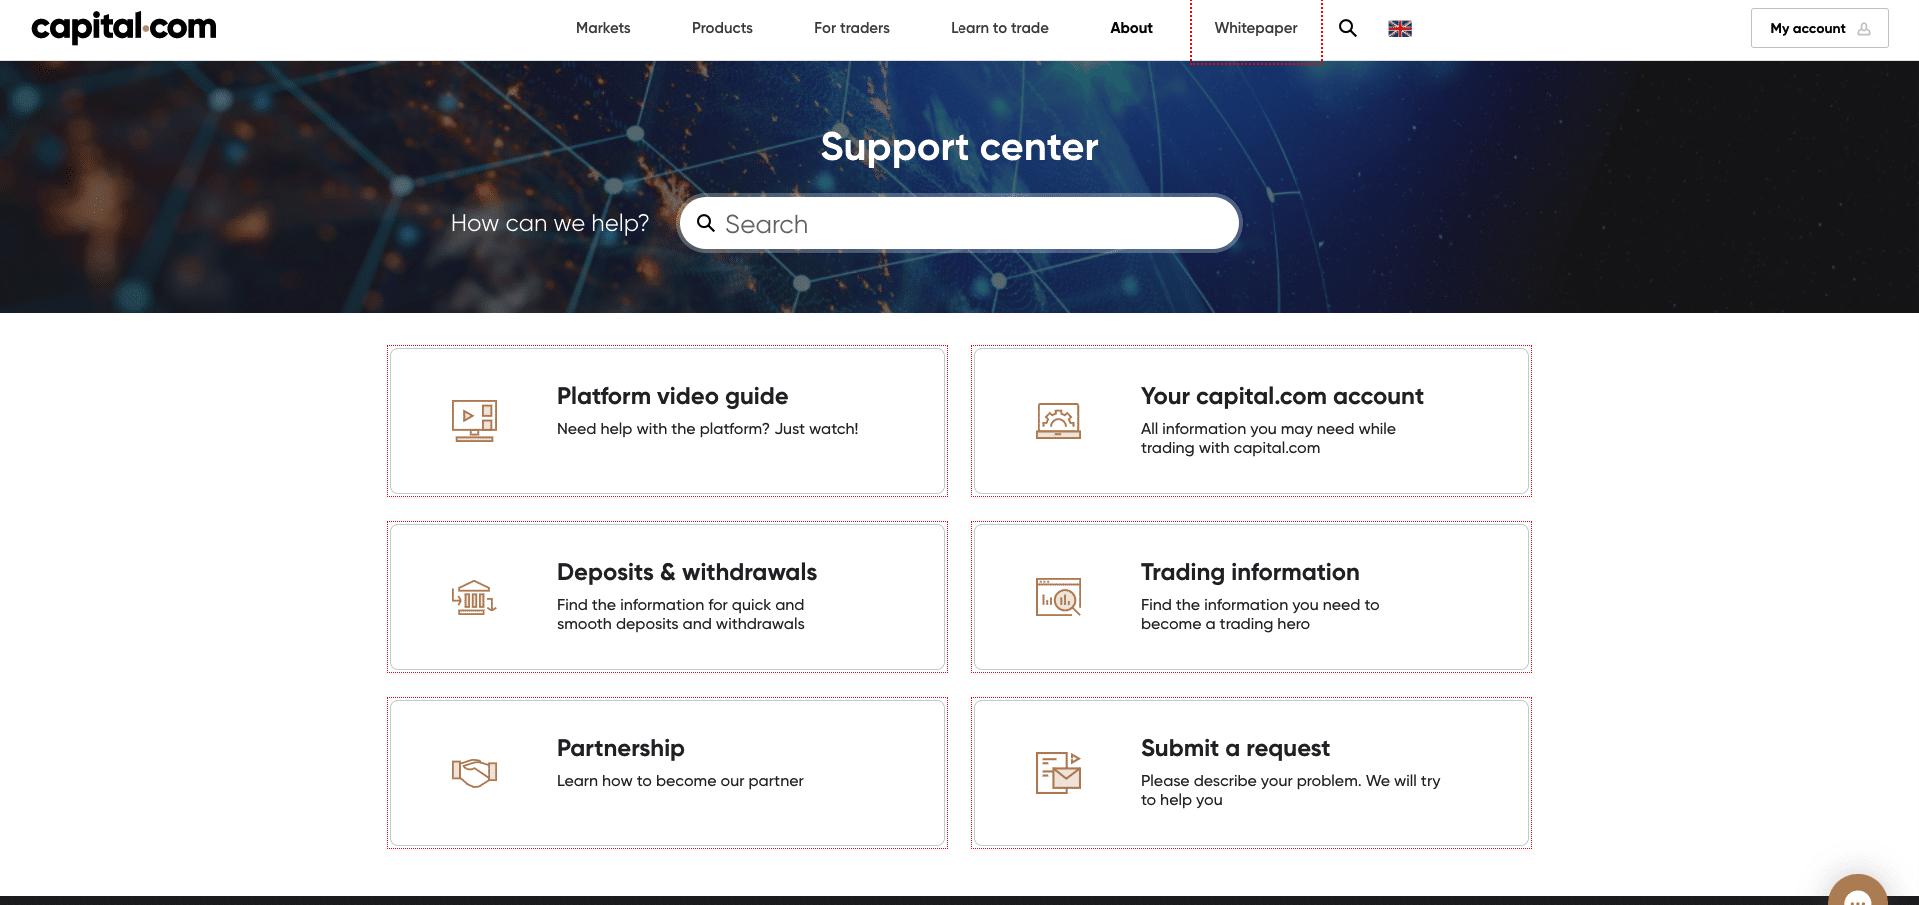 capital.com kundenservice